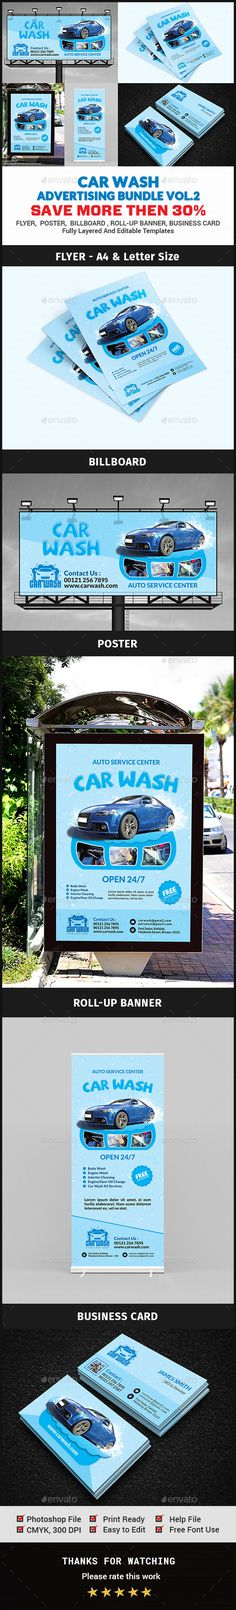 Car Wash Advertising Vol.2 Bundle